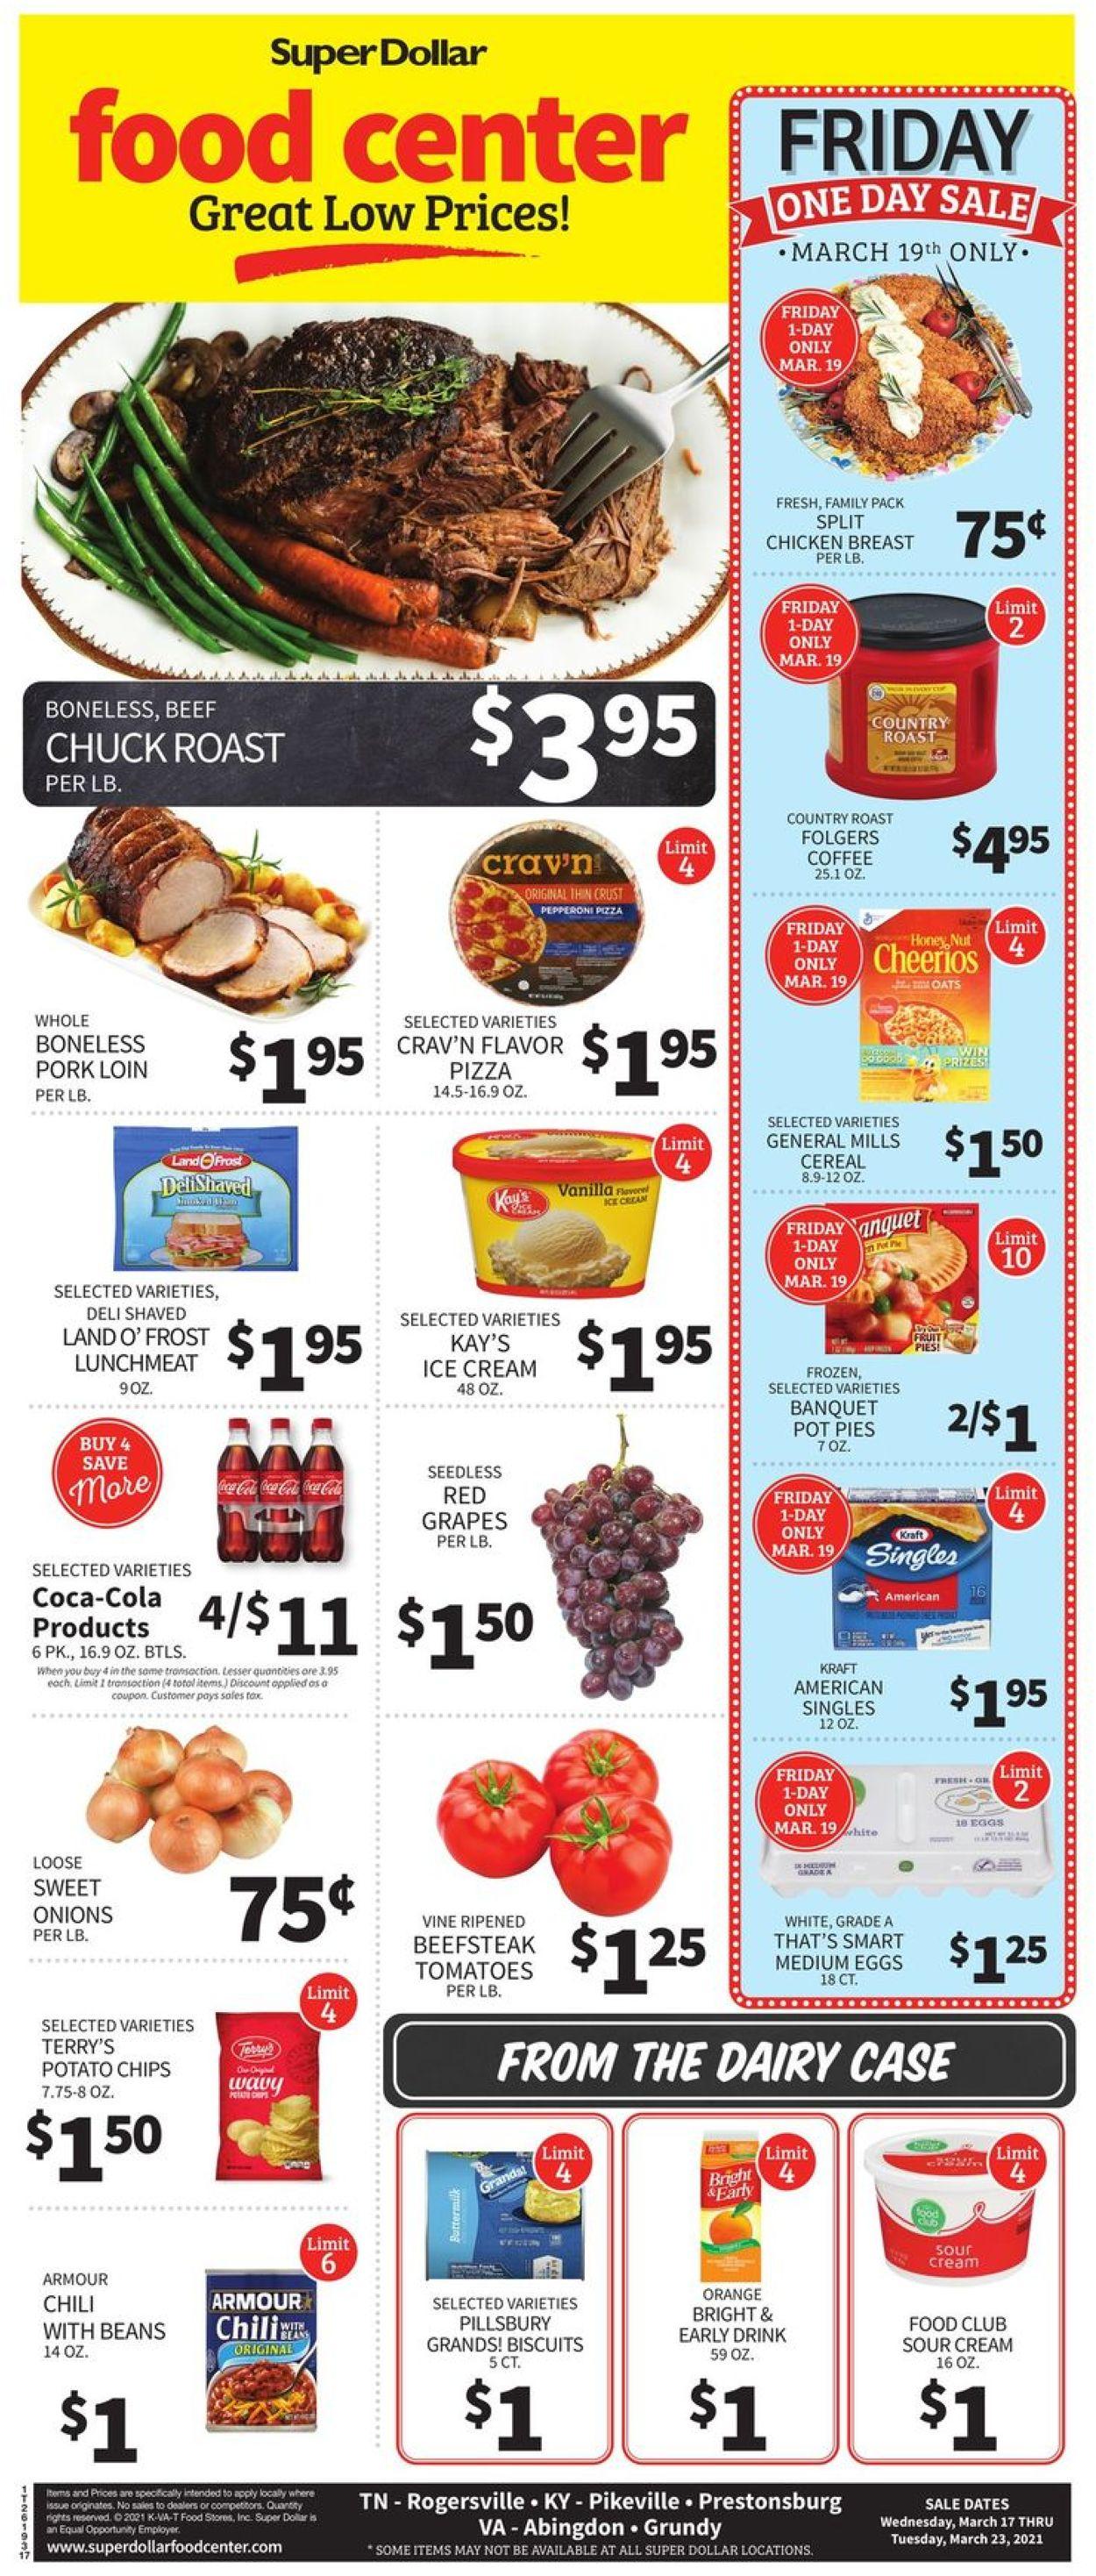 Super Dollar Food Center Weekly Ad Circular - valid 03/17-03/23/2021